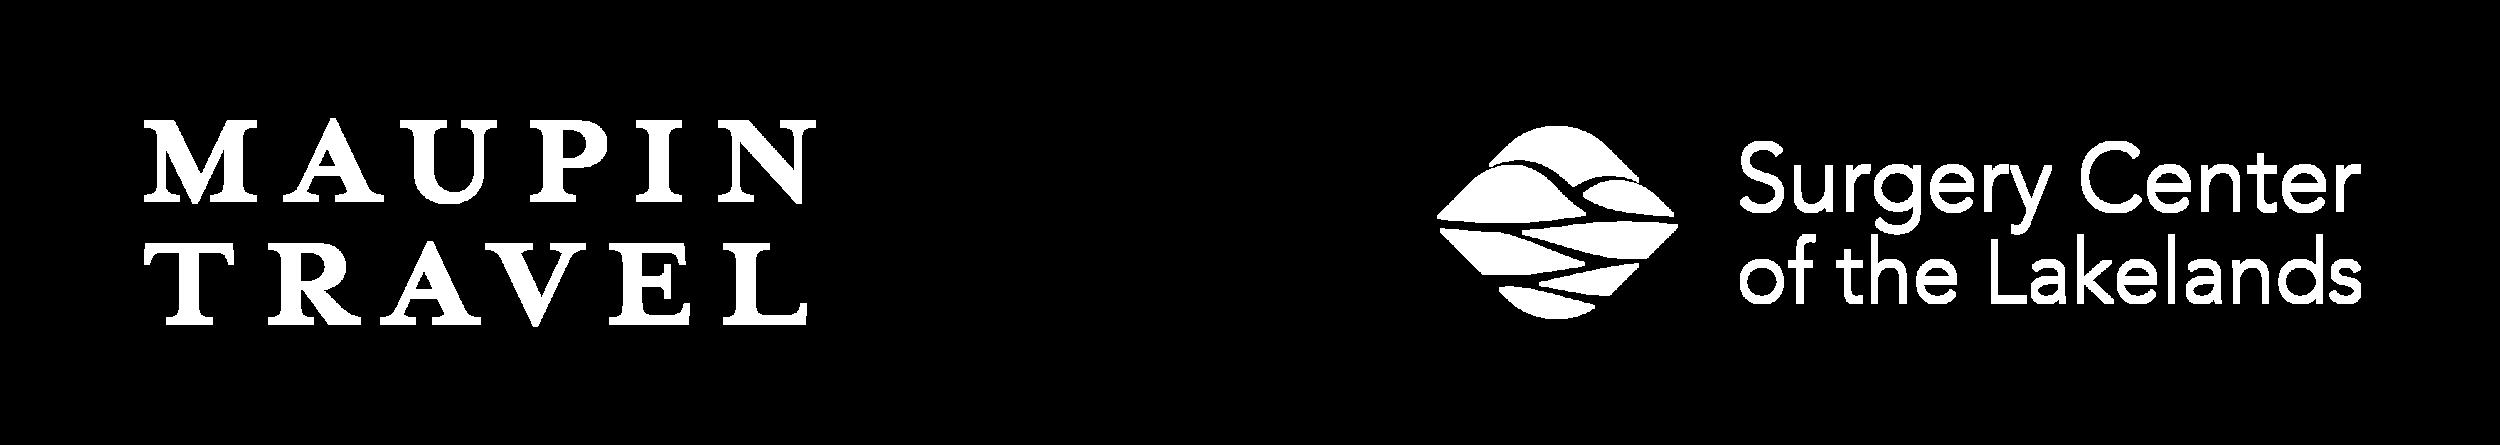 Client logos2-01.png